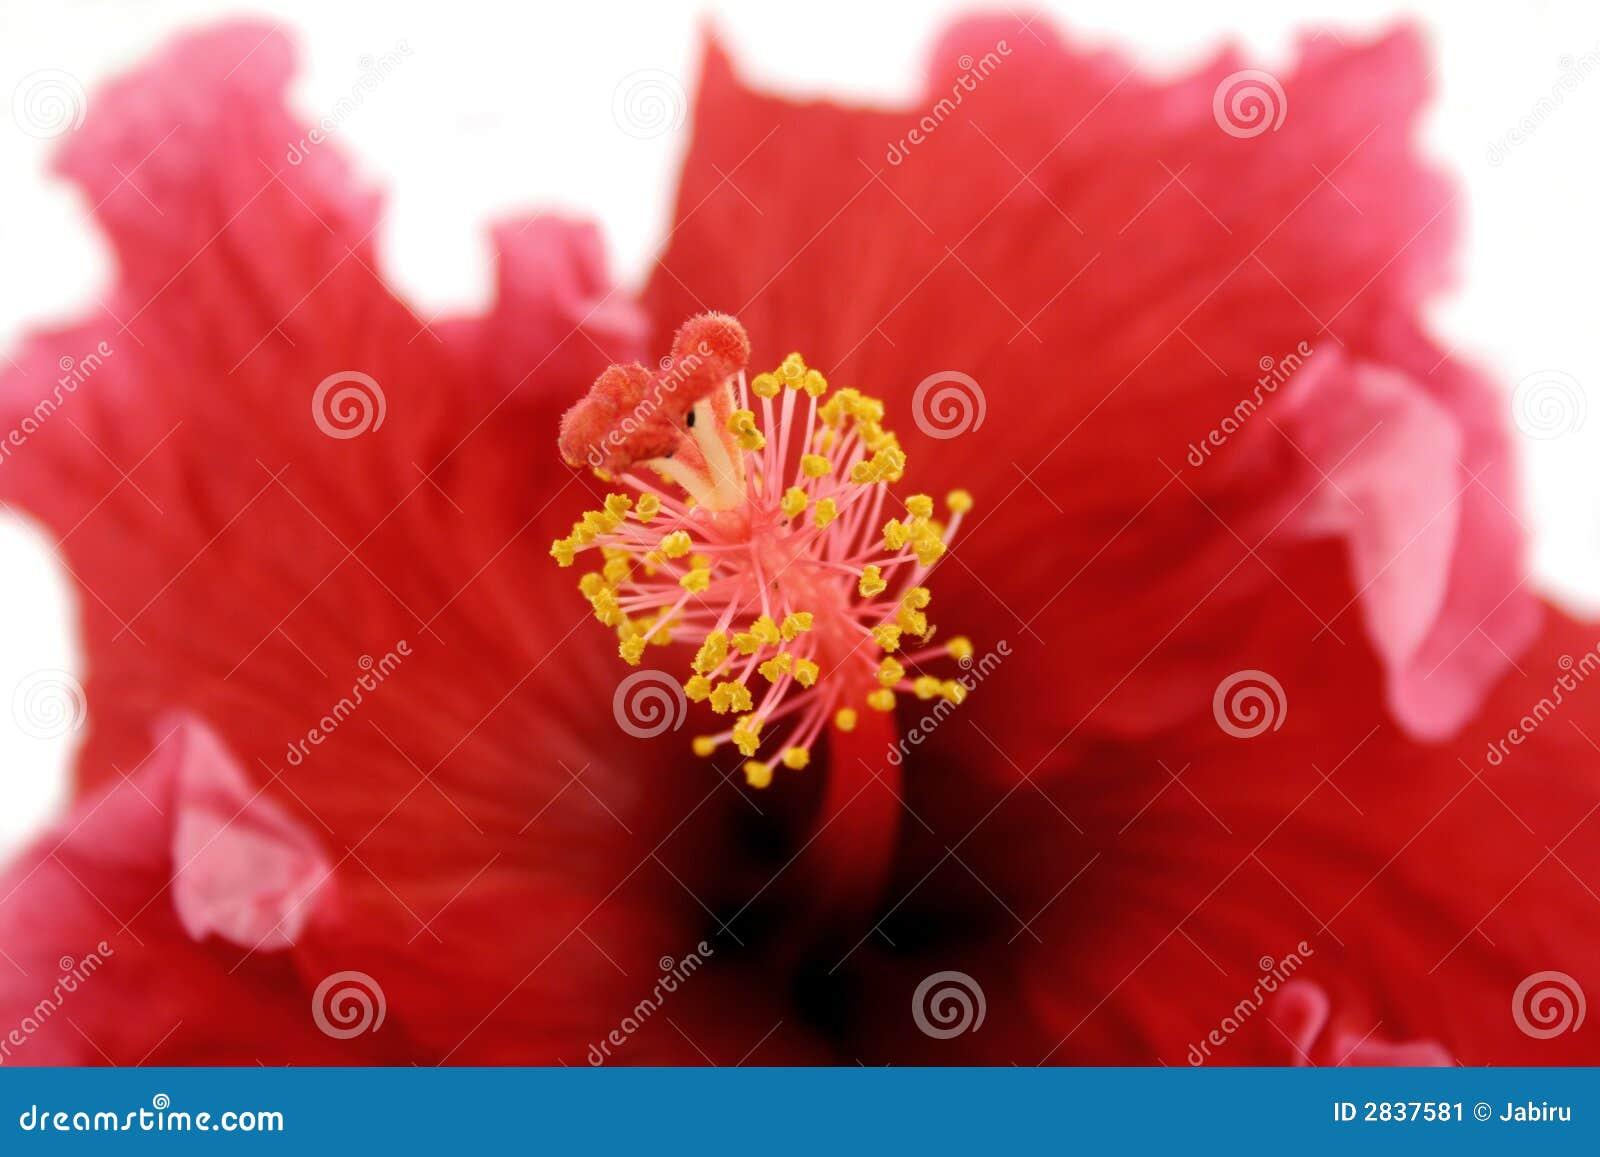 stamen of hibiscus 1 stock image image 2837581. Black Bedroom Furniture Sets. Home Design Ideas